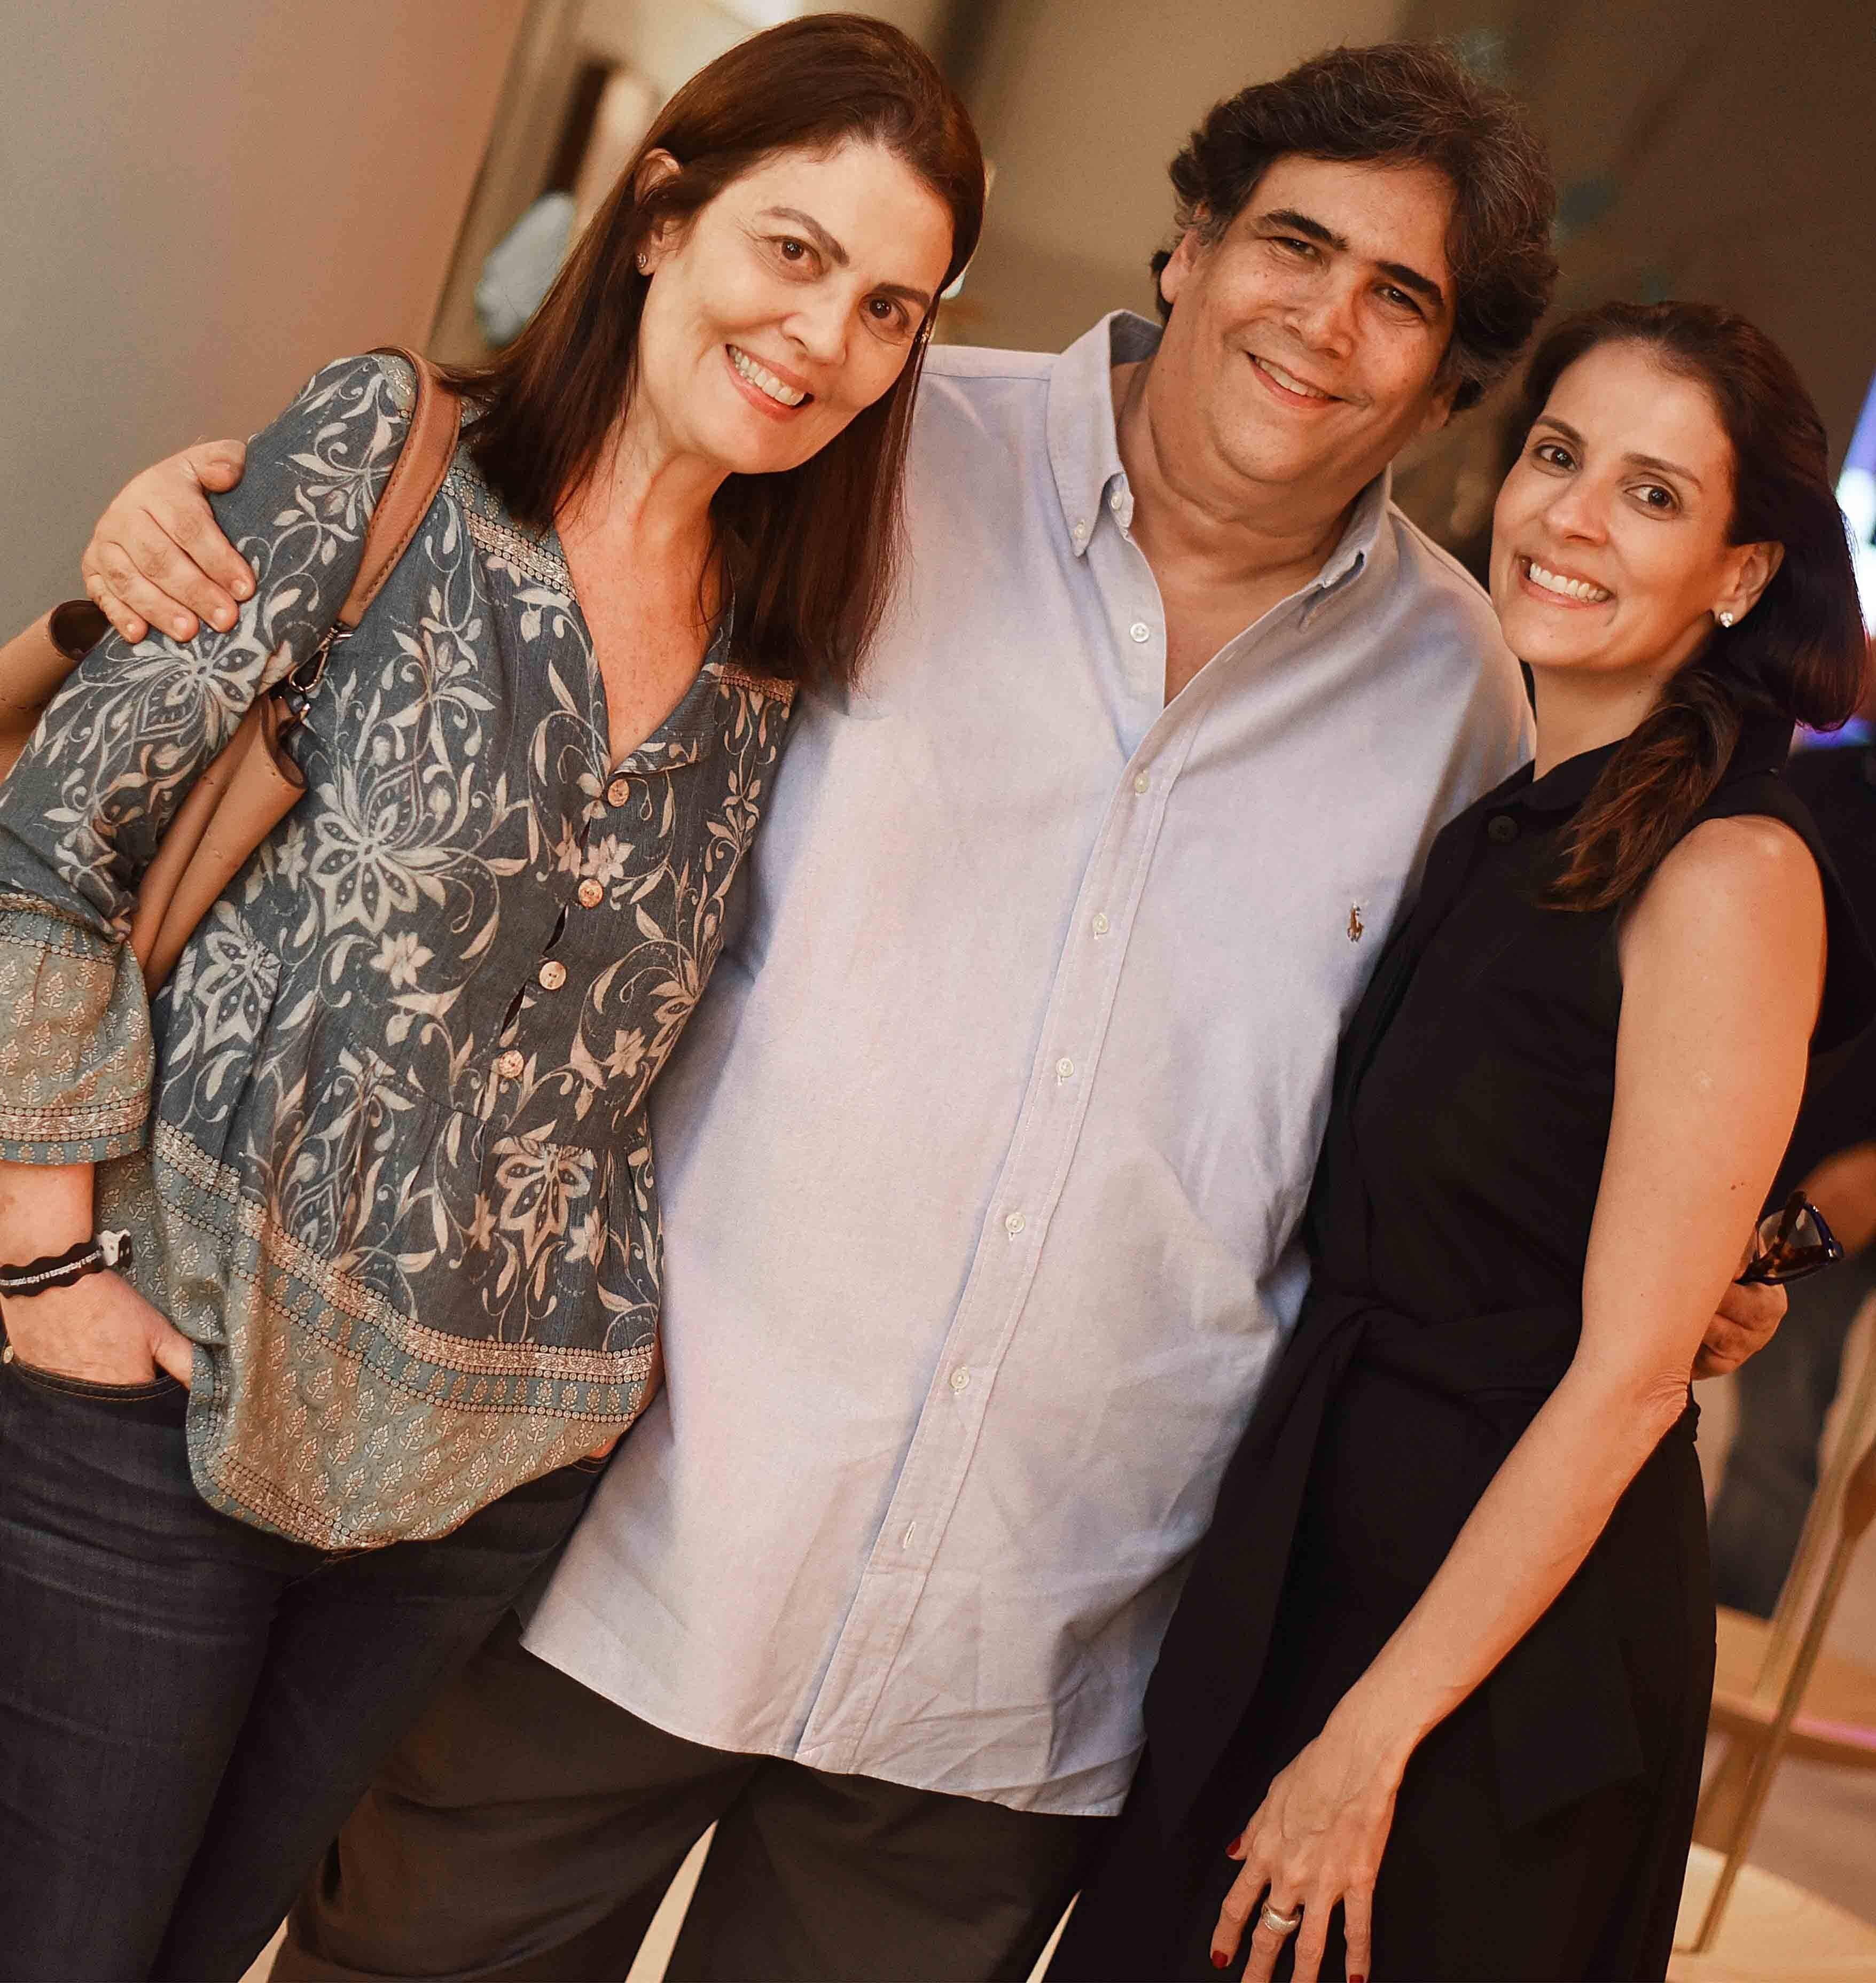 Tininha Machado Coelho, Antonio Neves da Rocha e Laura Paes /Foto: Ari Kaye